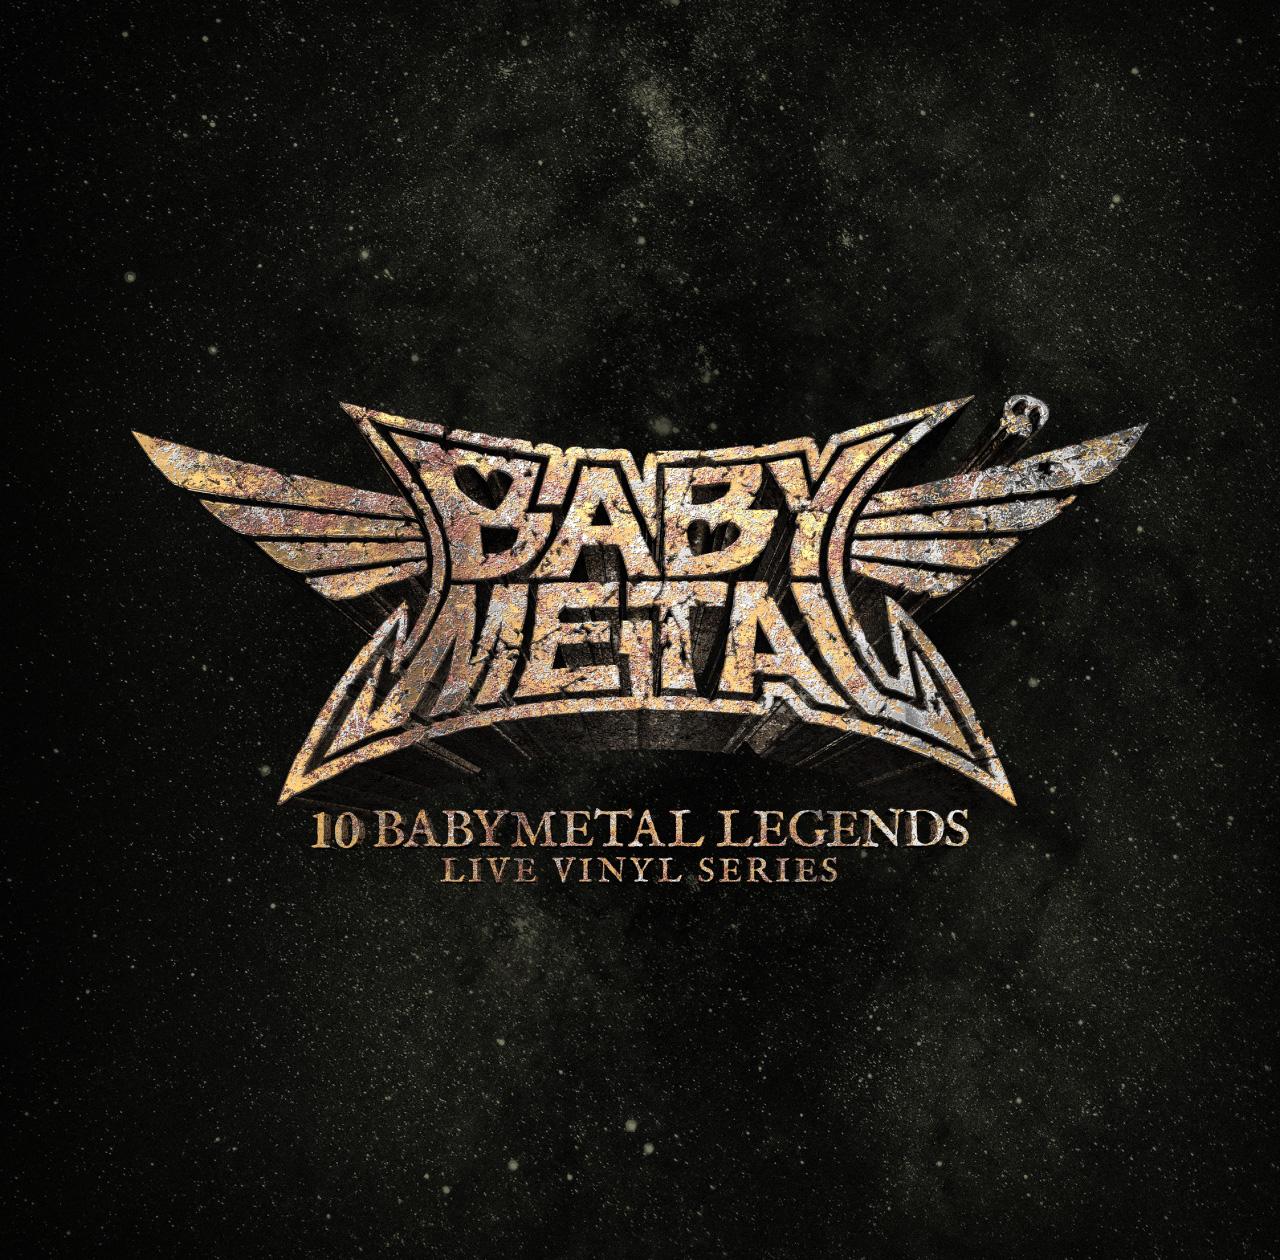 10-bm-legends-live-vinyl-series_key-visual-2-2